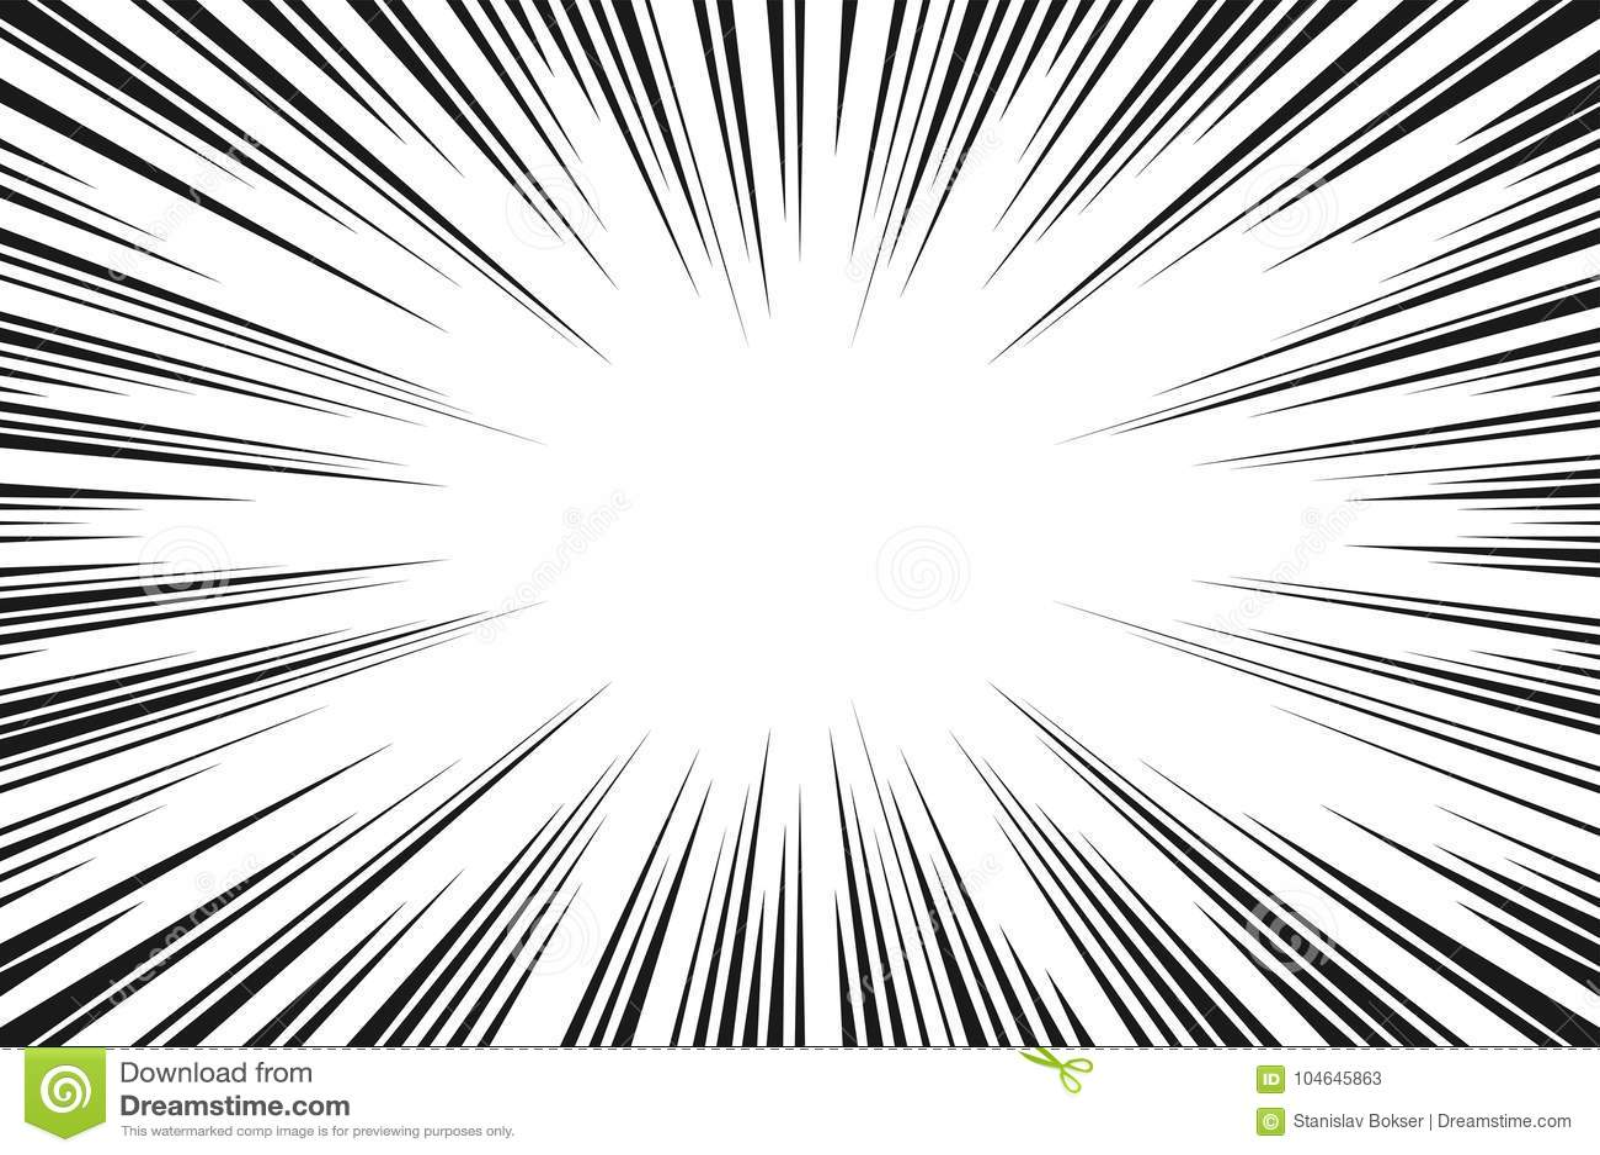 Black And White Radial Lines Comics Style Backround. Manga